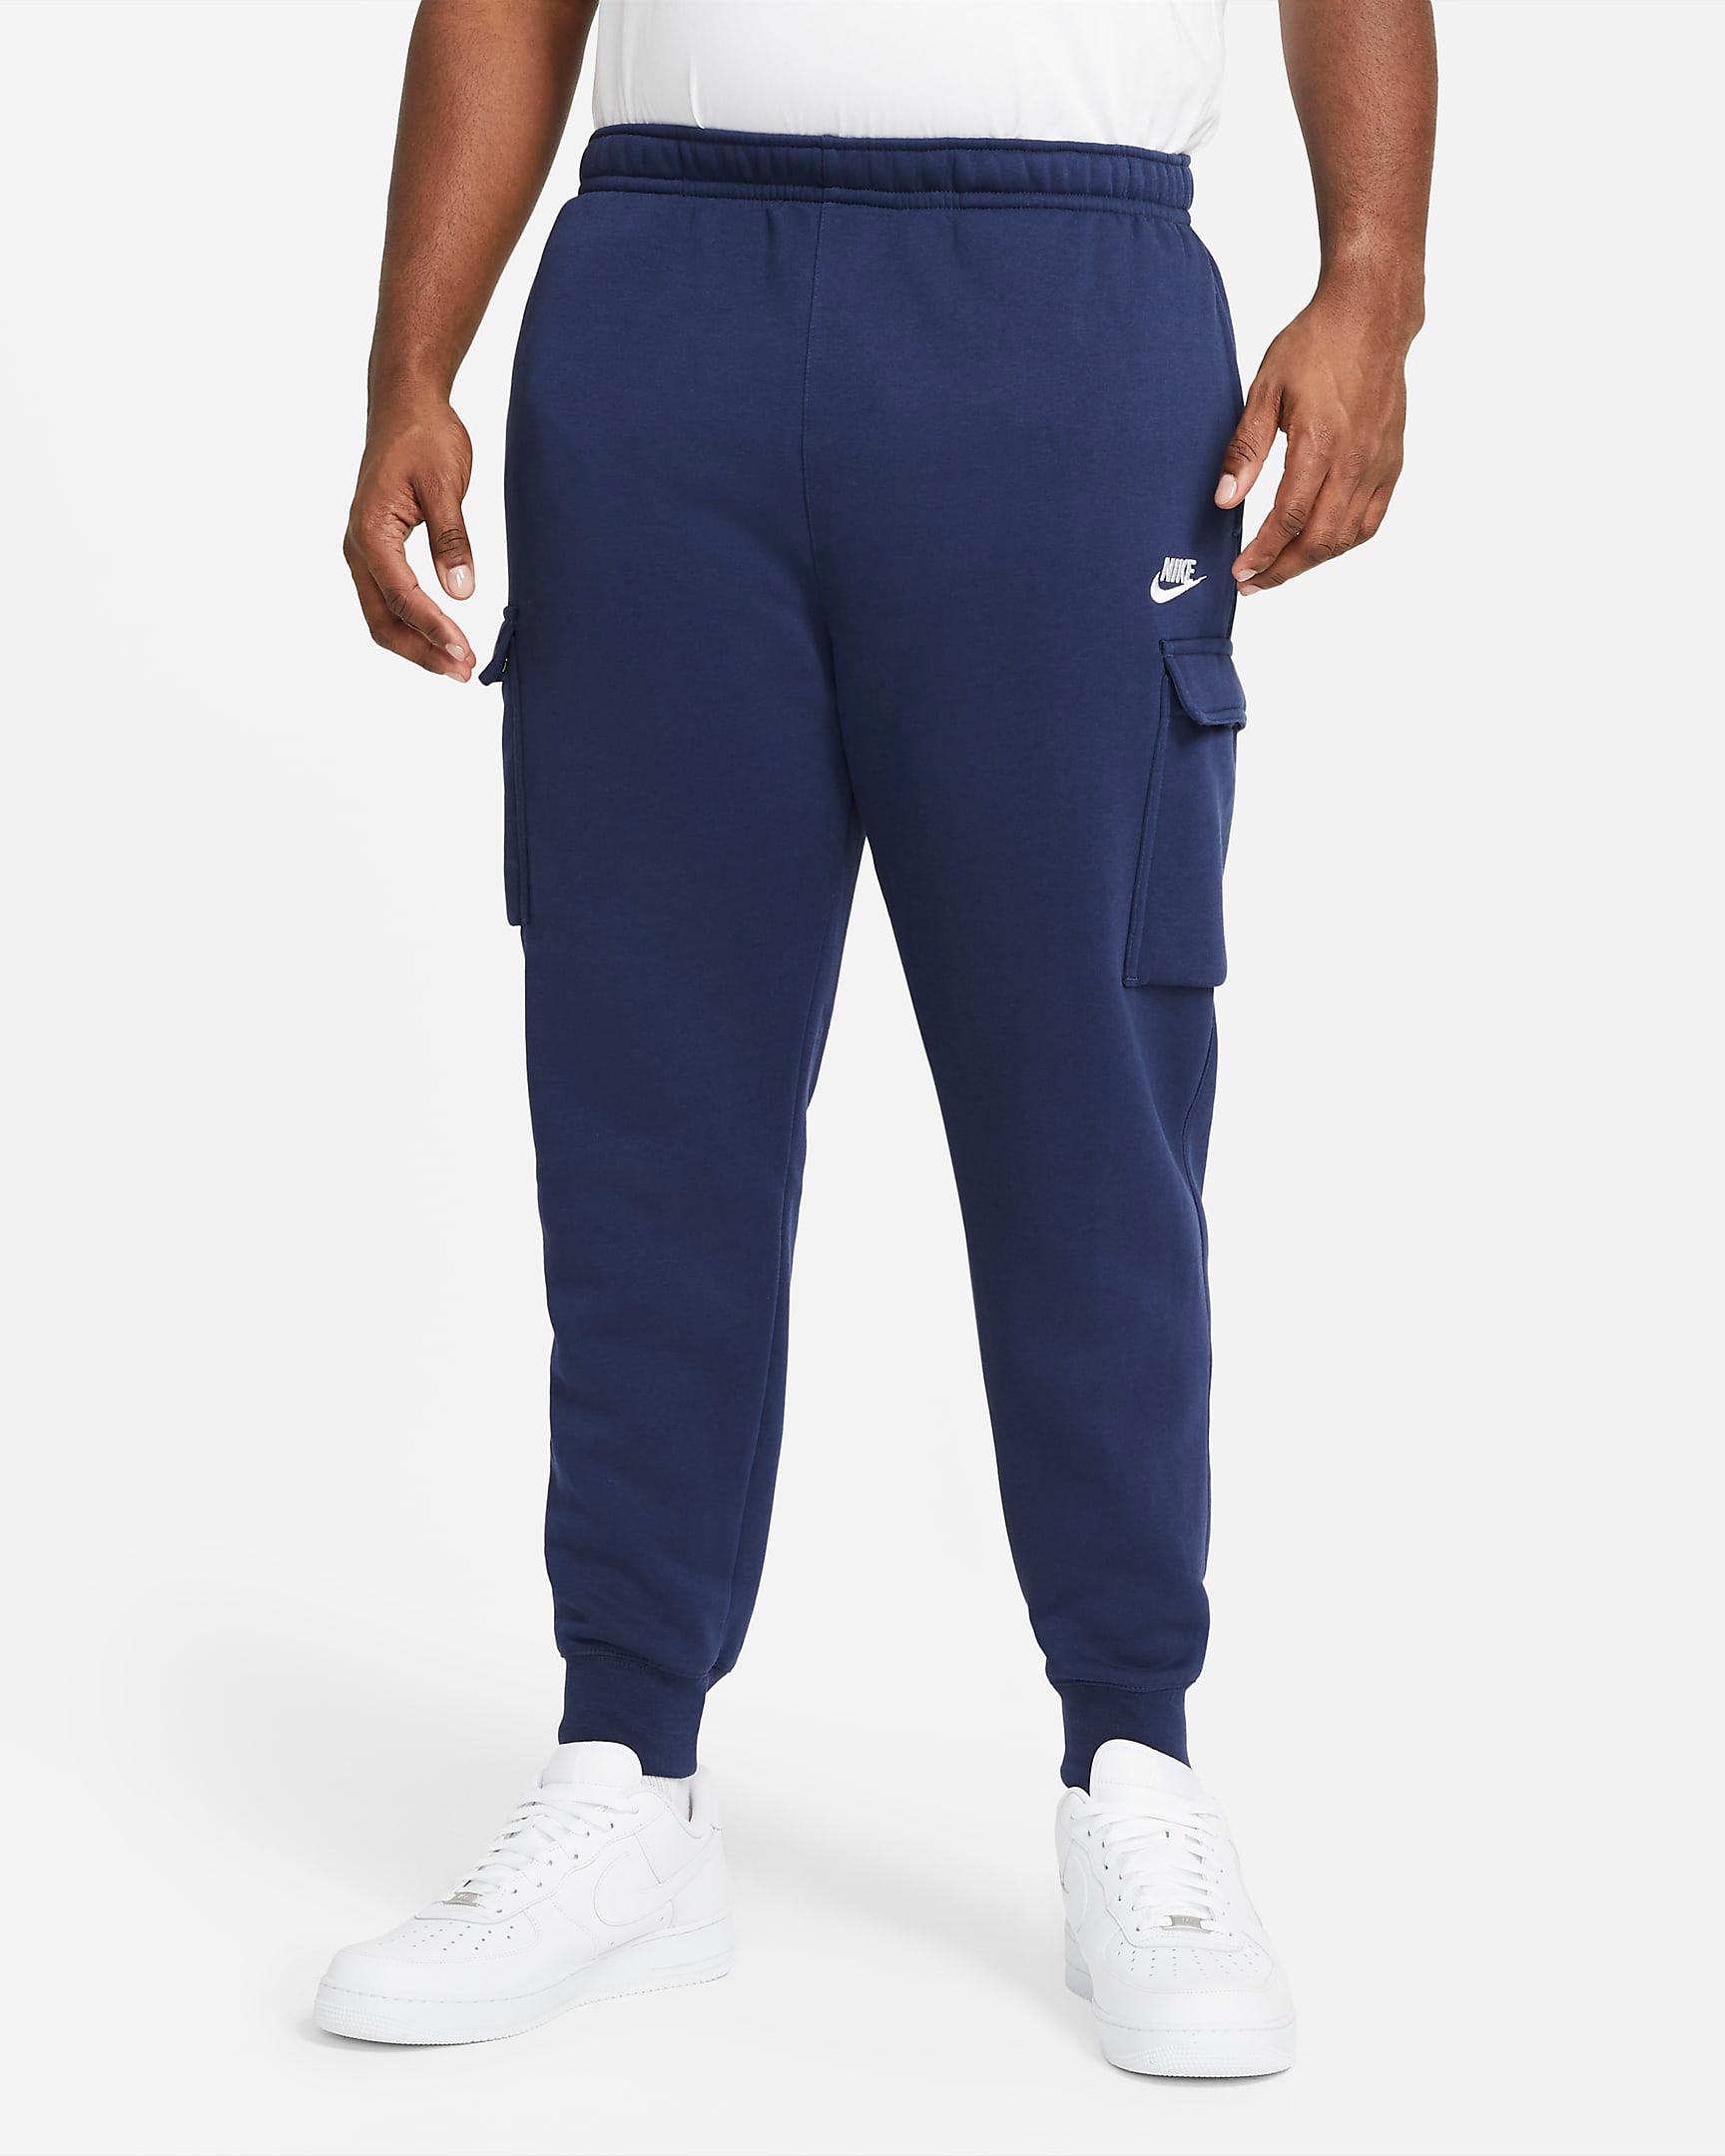 jordan-3-midnight-navy-nike-club-cargo-pants